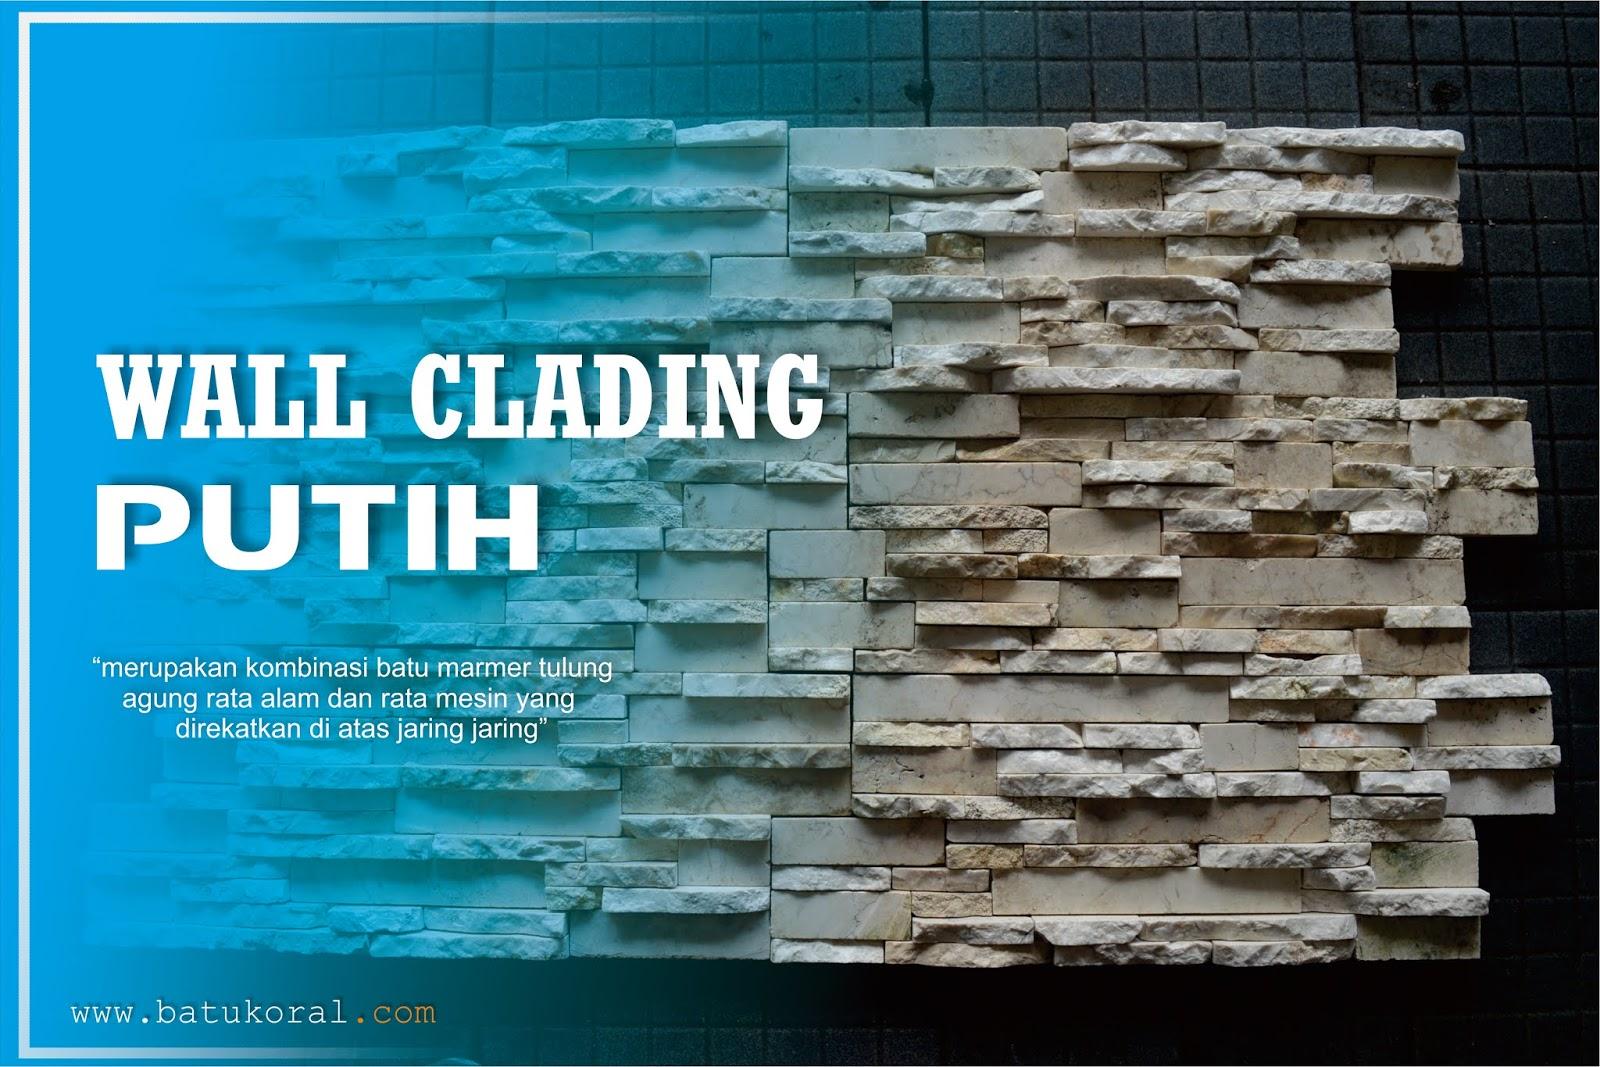 wall clading putih